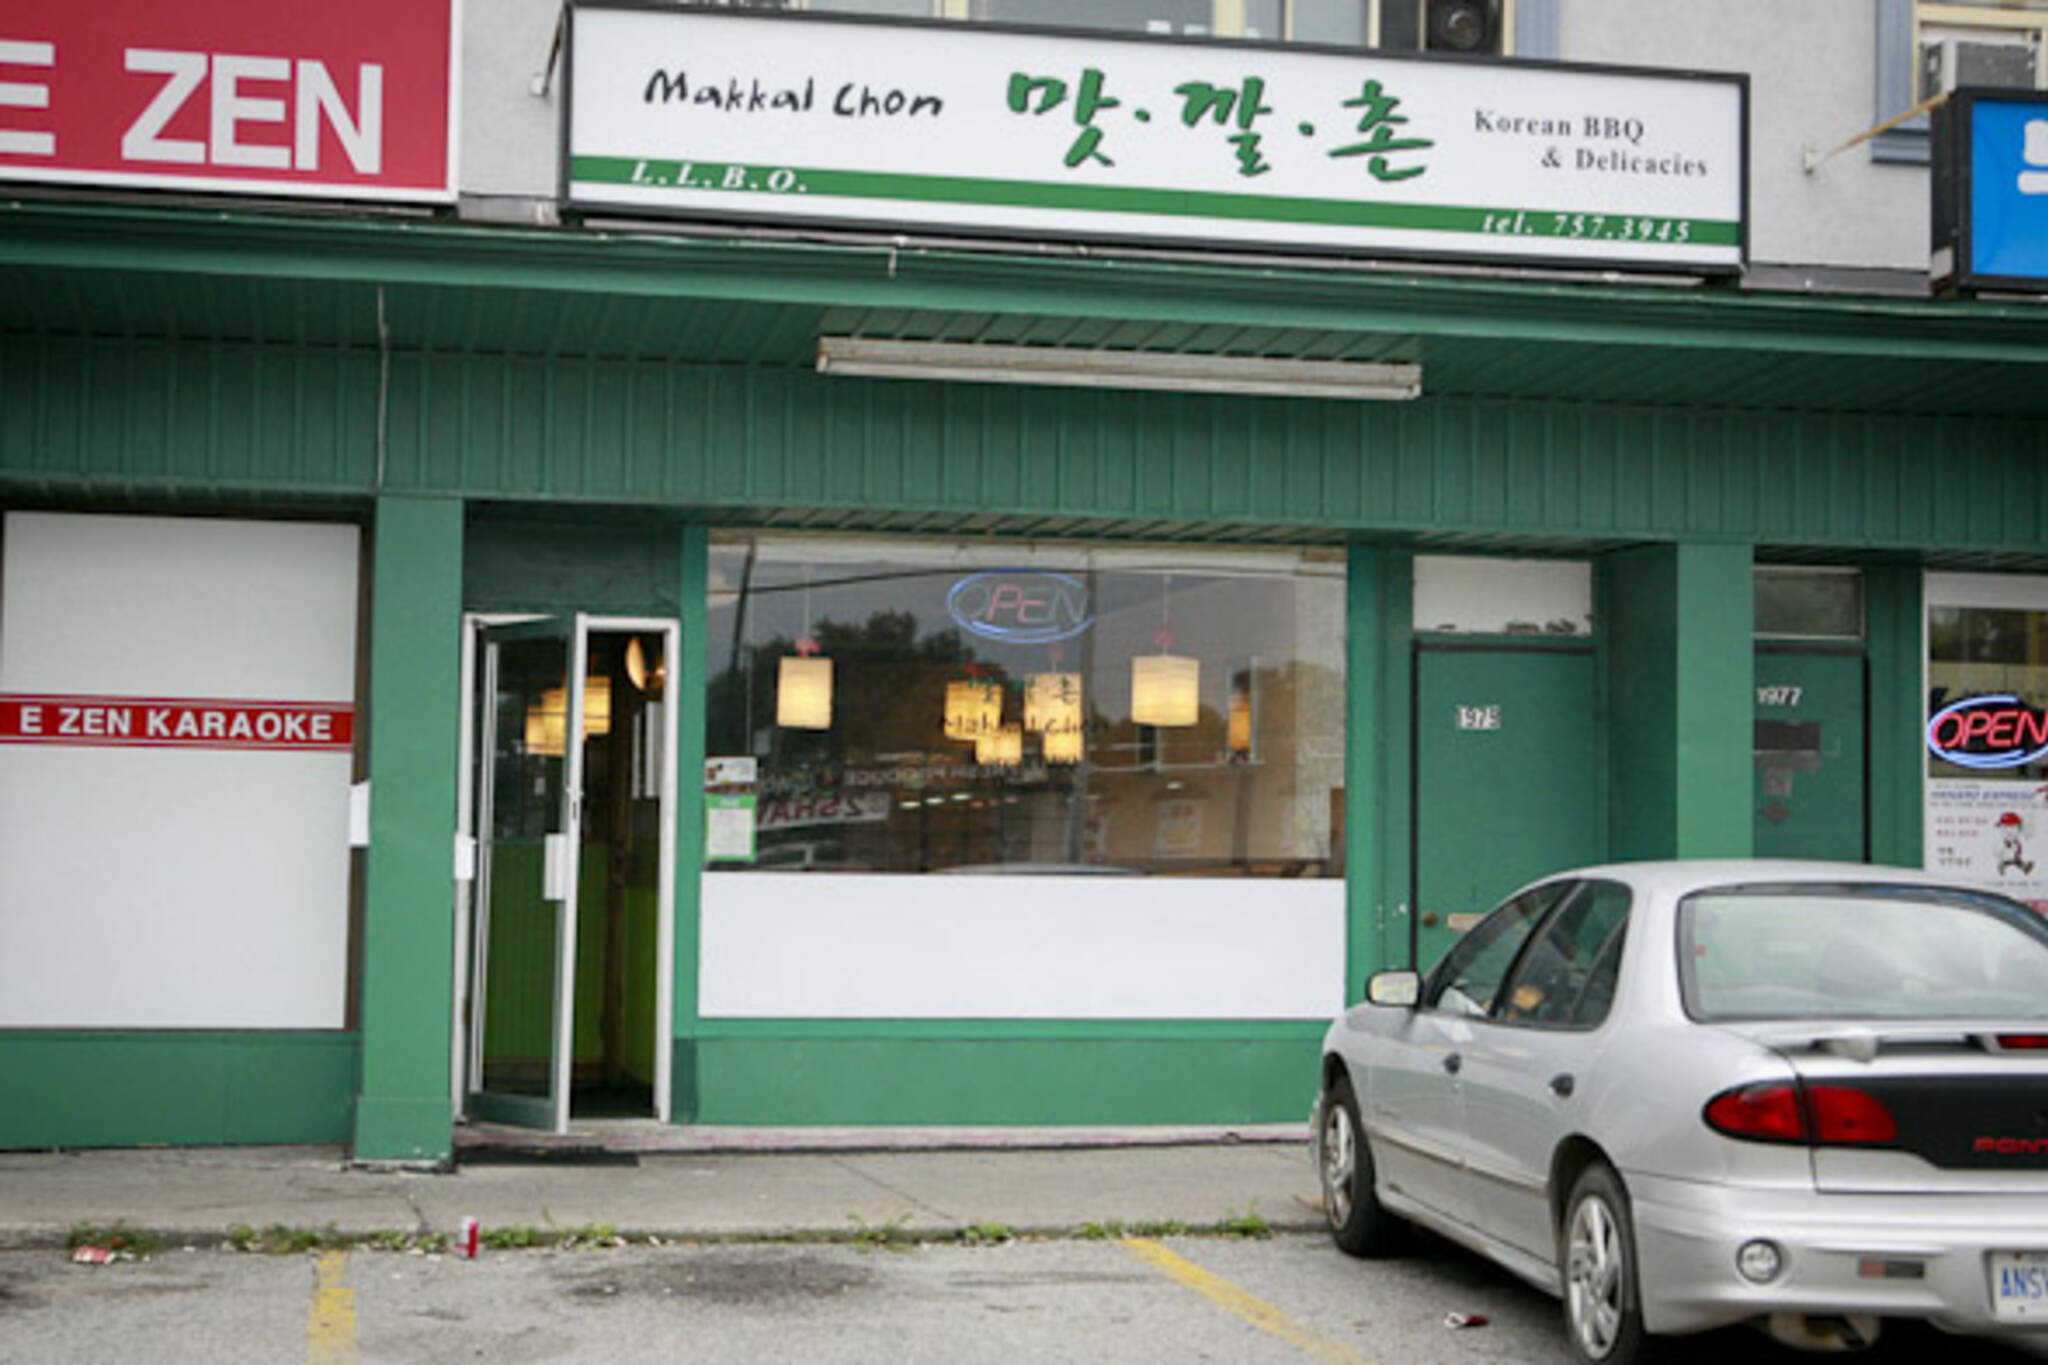 Makkalchon Toronto